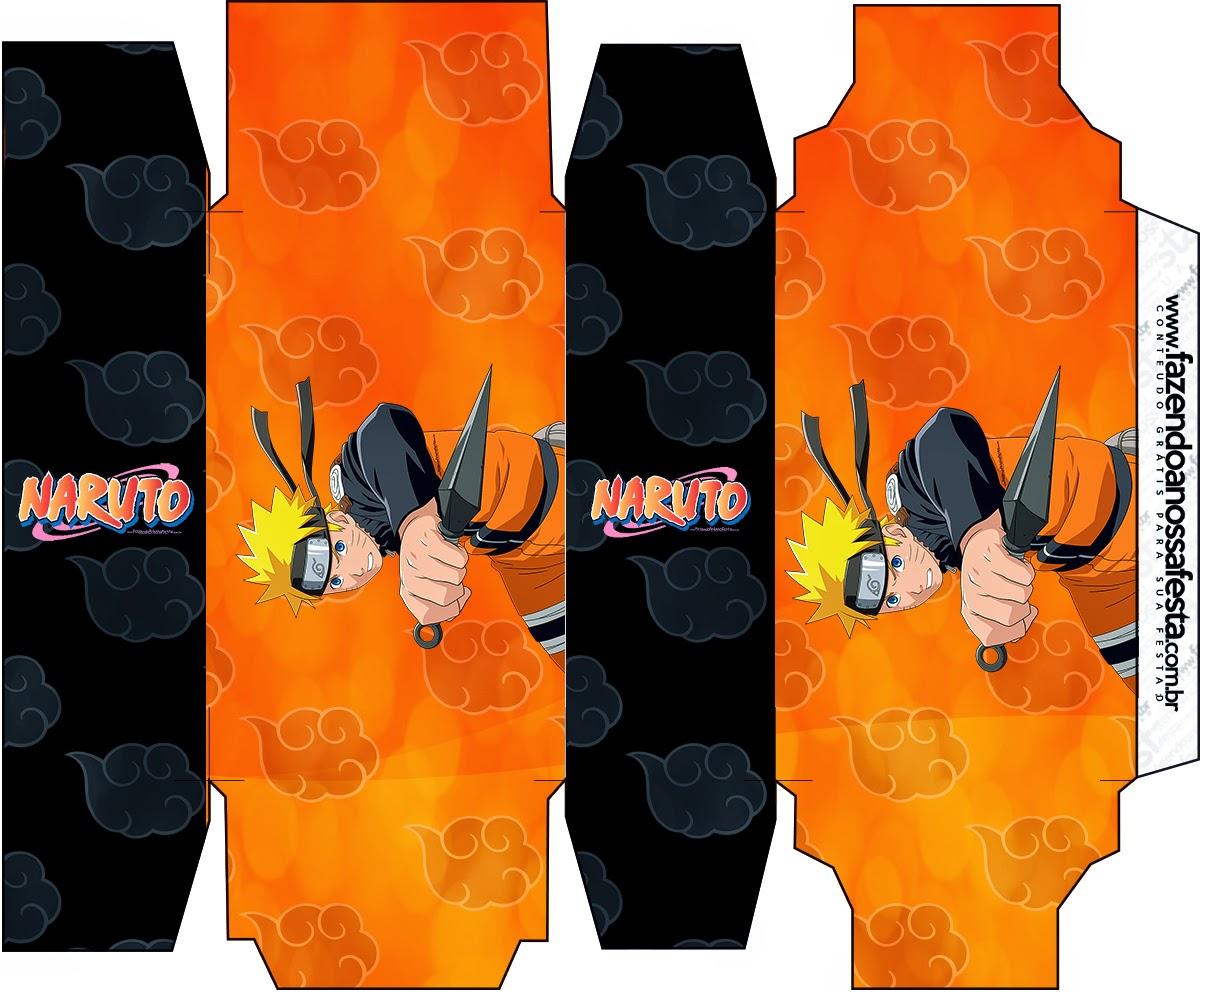 Caja de Naruto Negro para Imprimir Gratis.